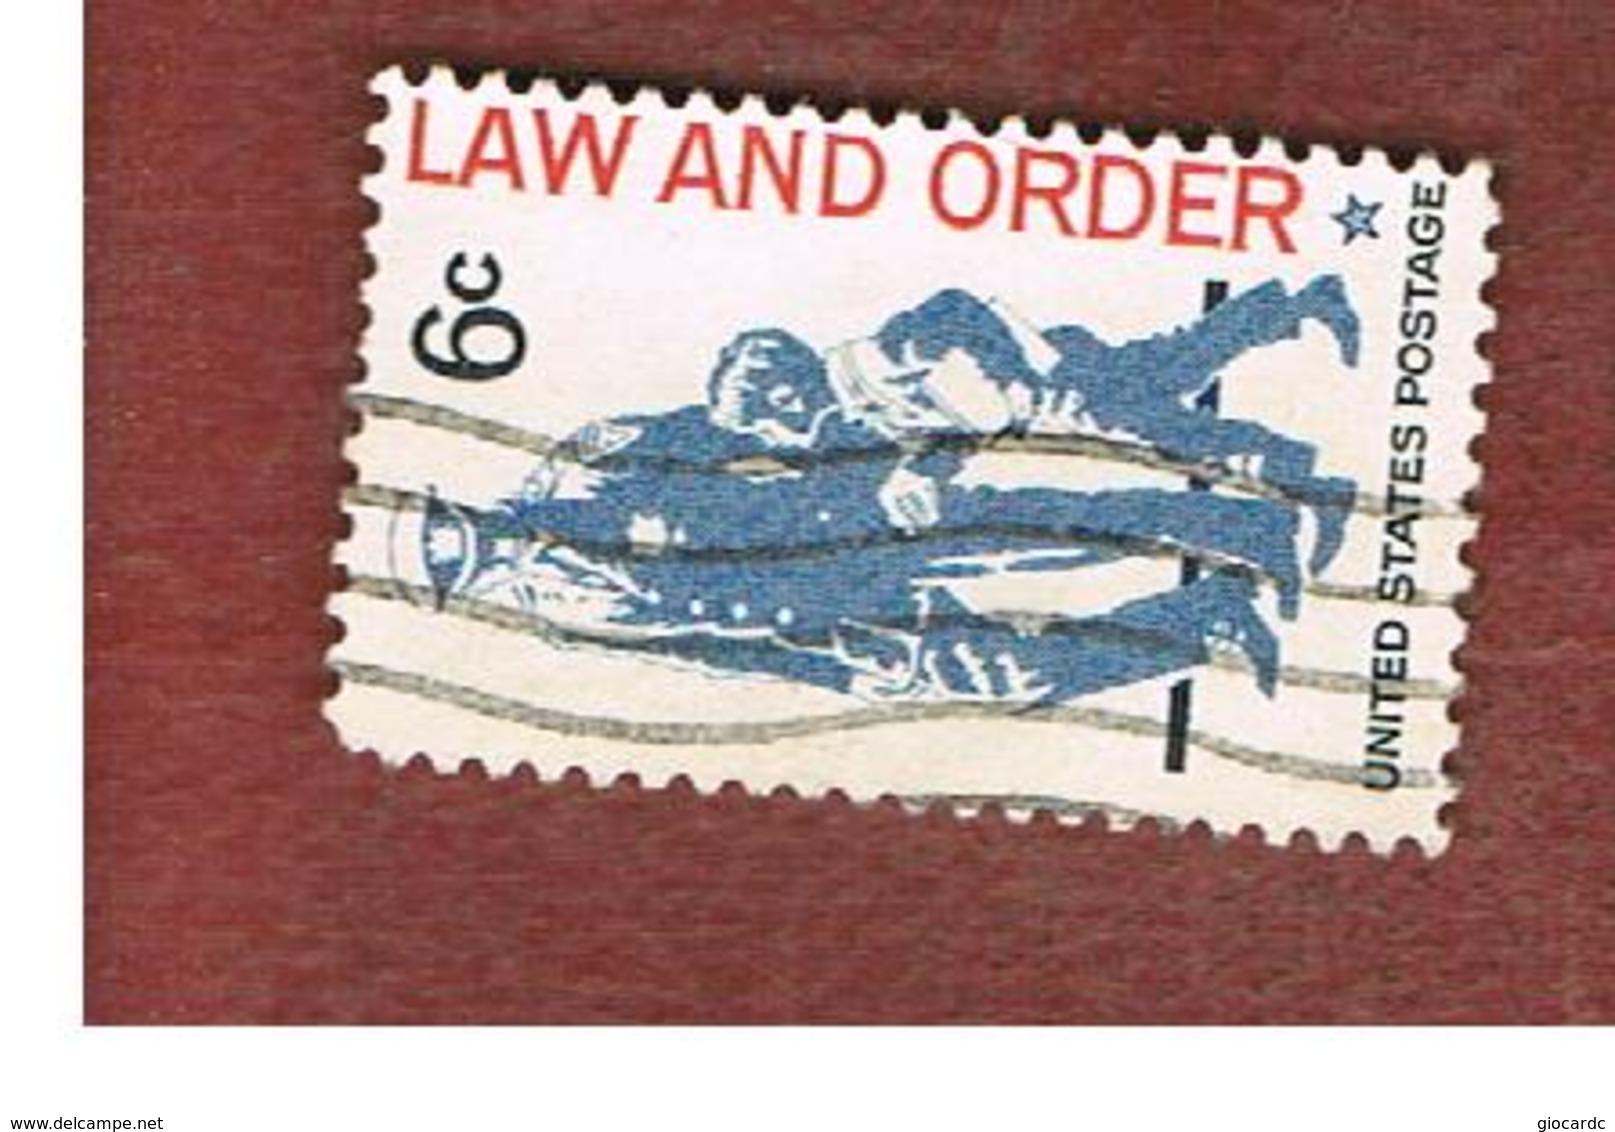 STATI UNITI (U.S.A.) - SG 1328  - 1968  LAW AND ORDER     - USED° - Stati Uniti